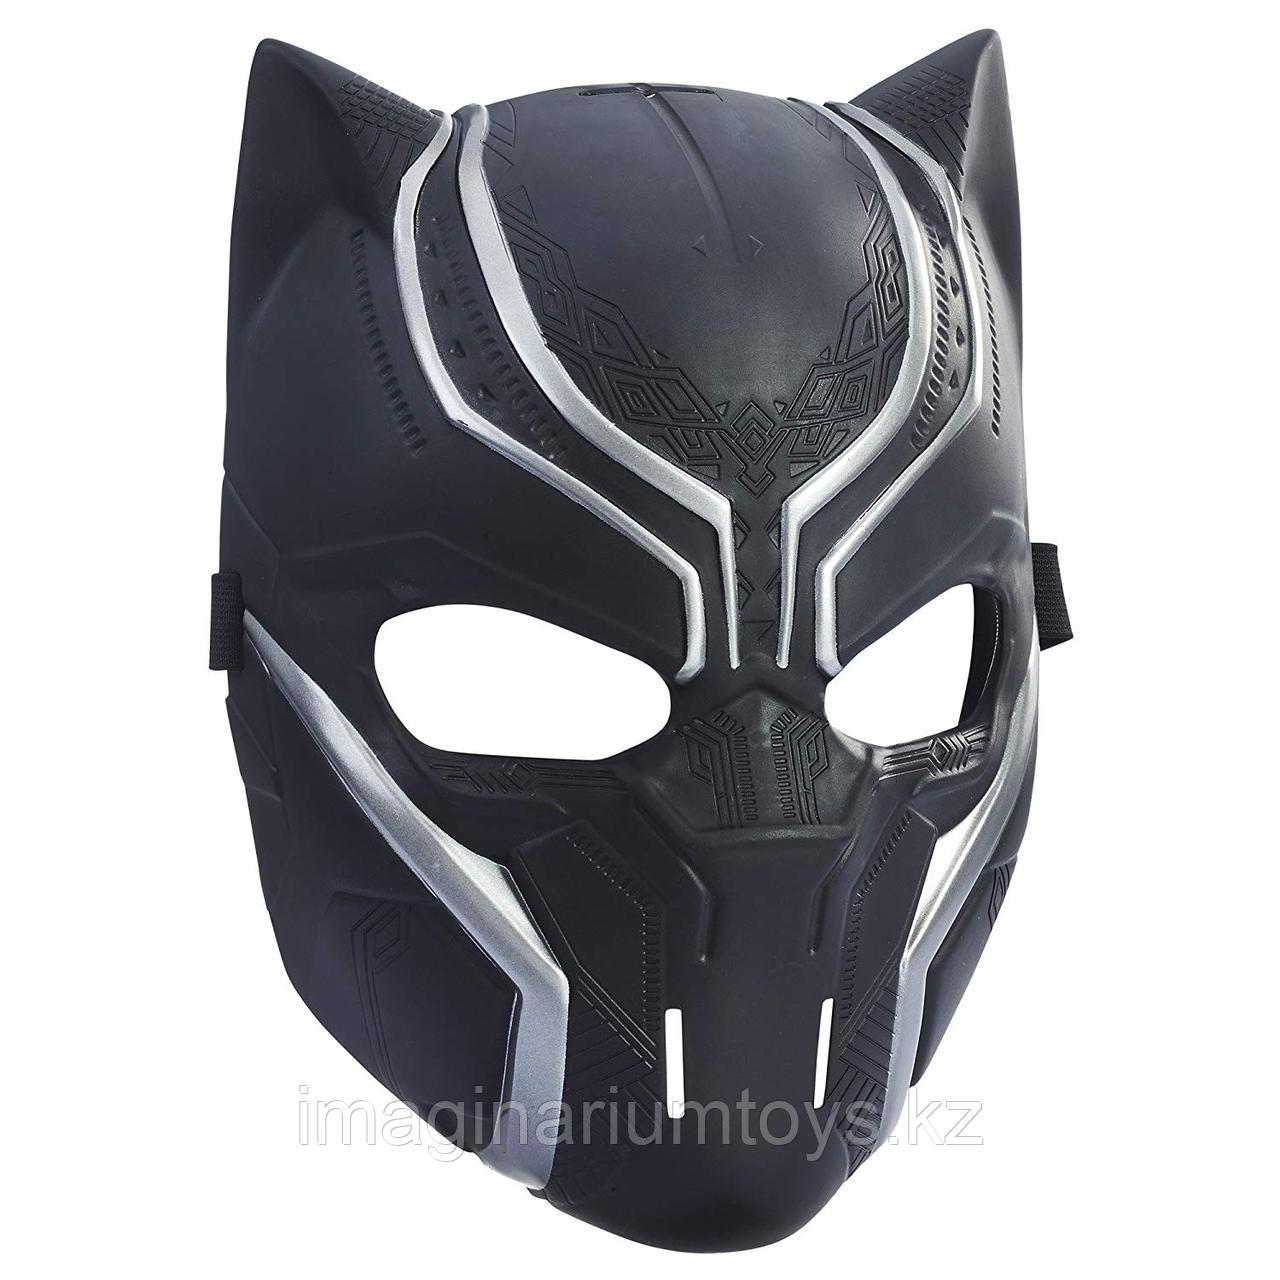 Черная пантера Маска супергероя Marvel Black Panther